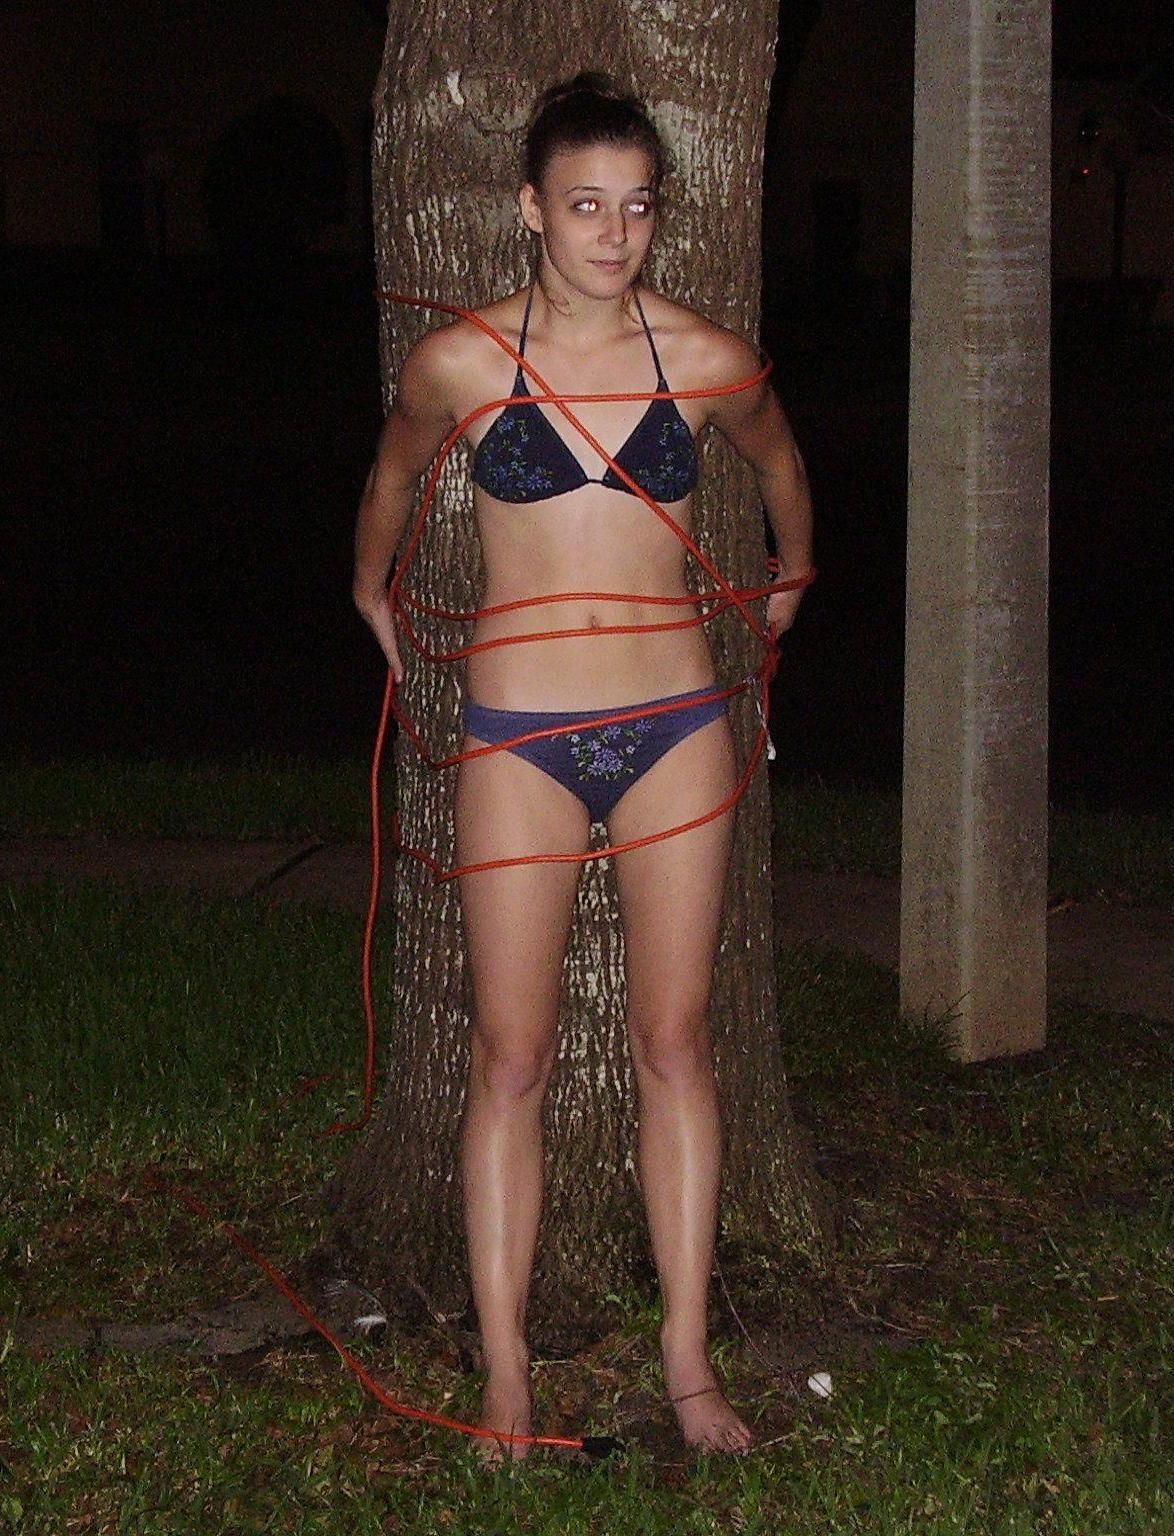 Outdoor Teen Delight  Bondage  Fashion, Style, Outdoor-7784